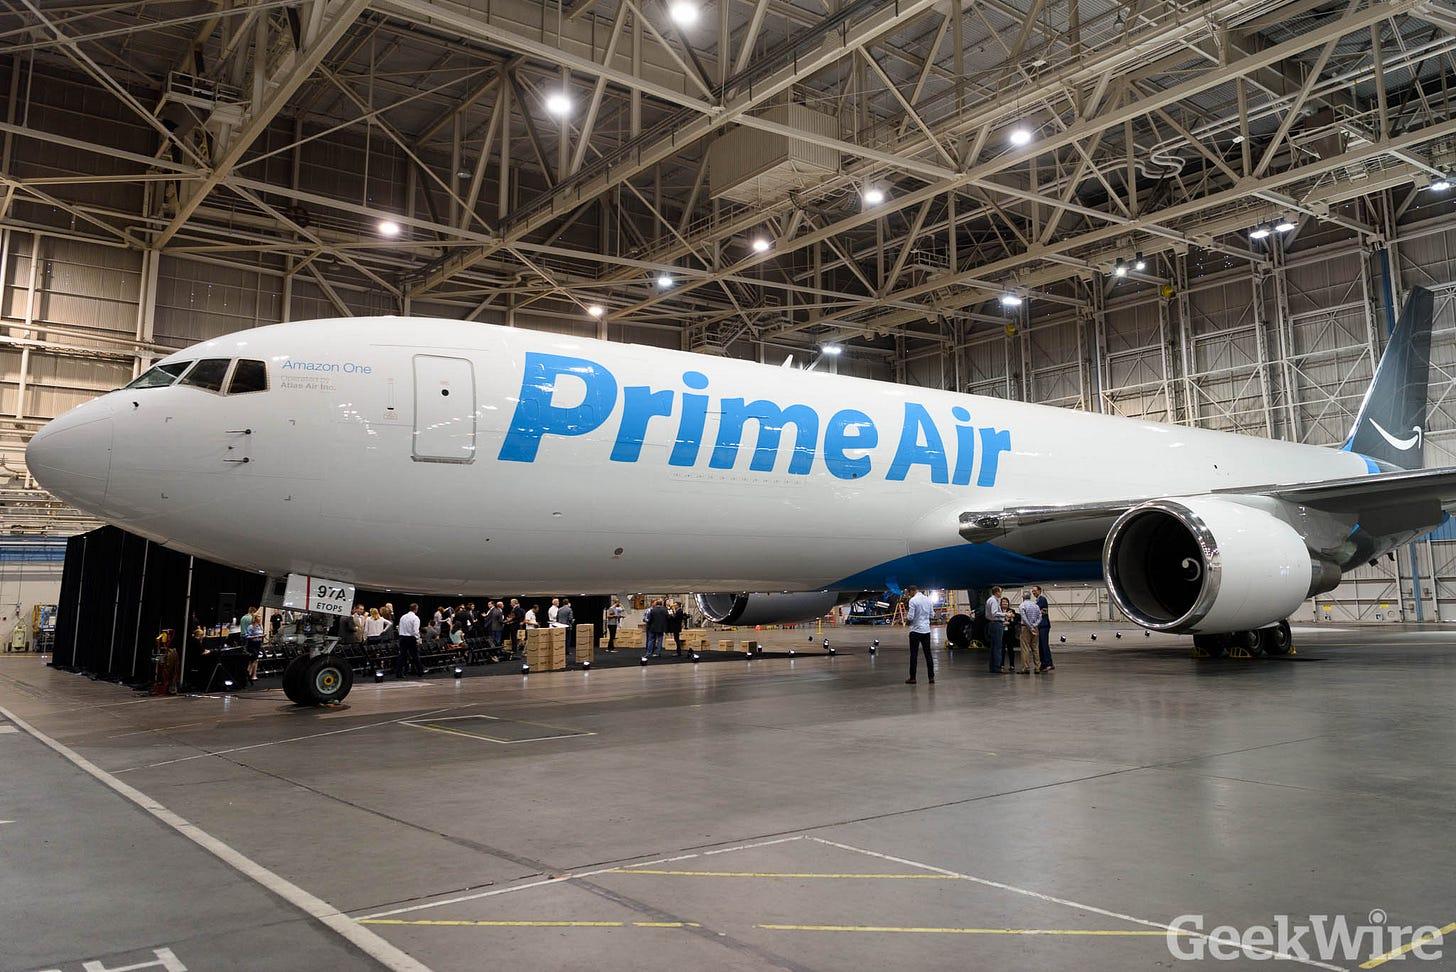 Amazon Prime airplane debuts after secret night flight - GeekWire